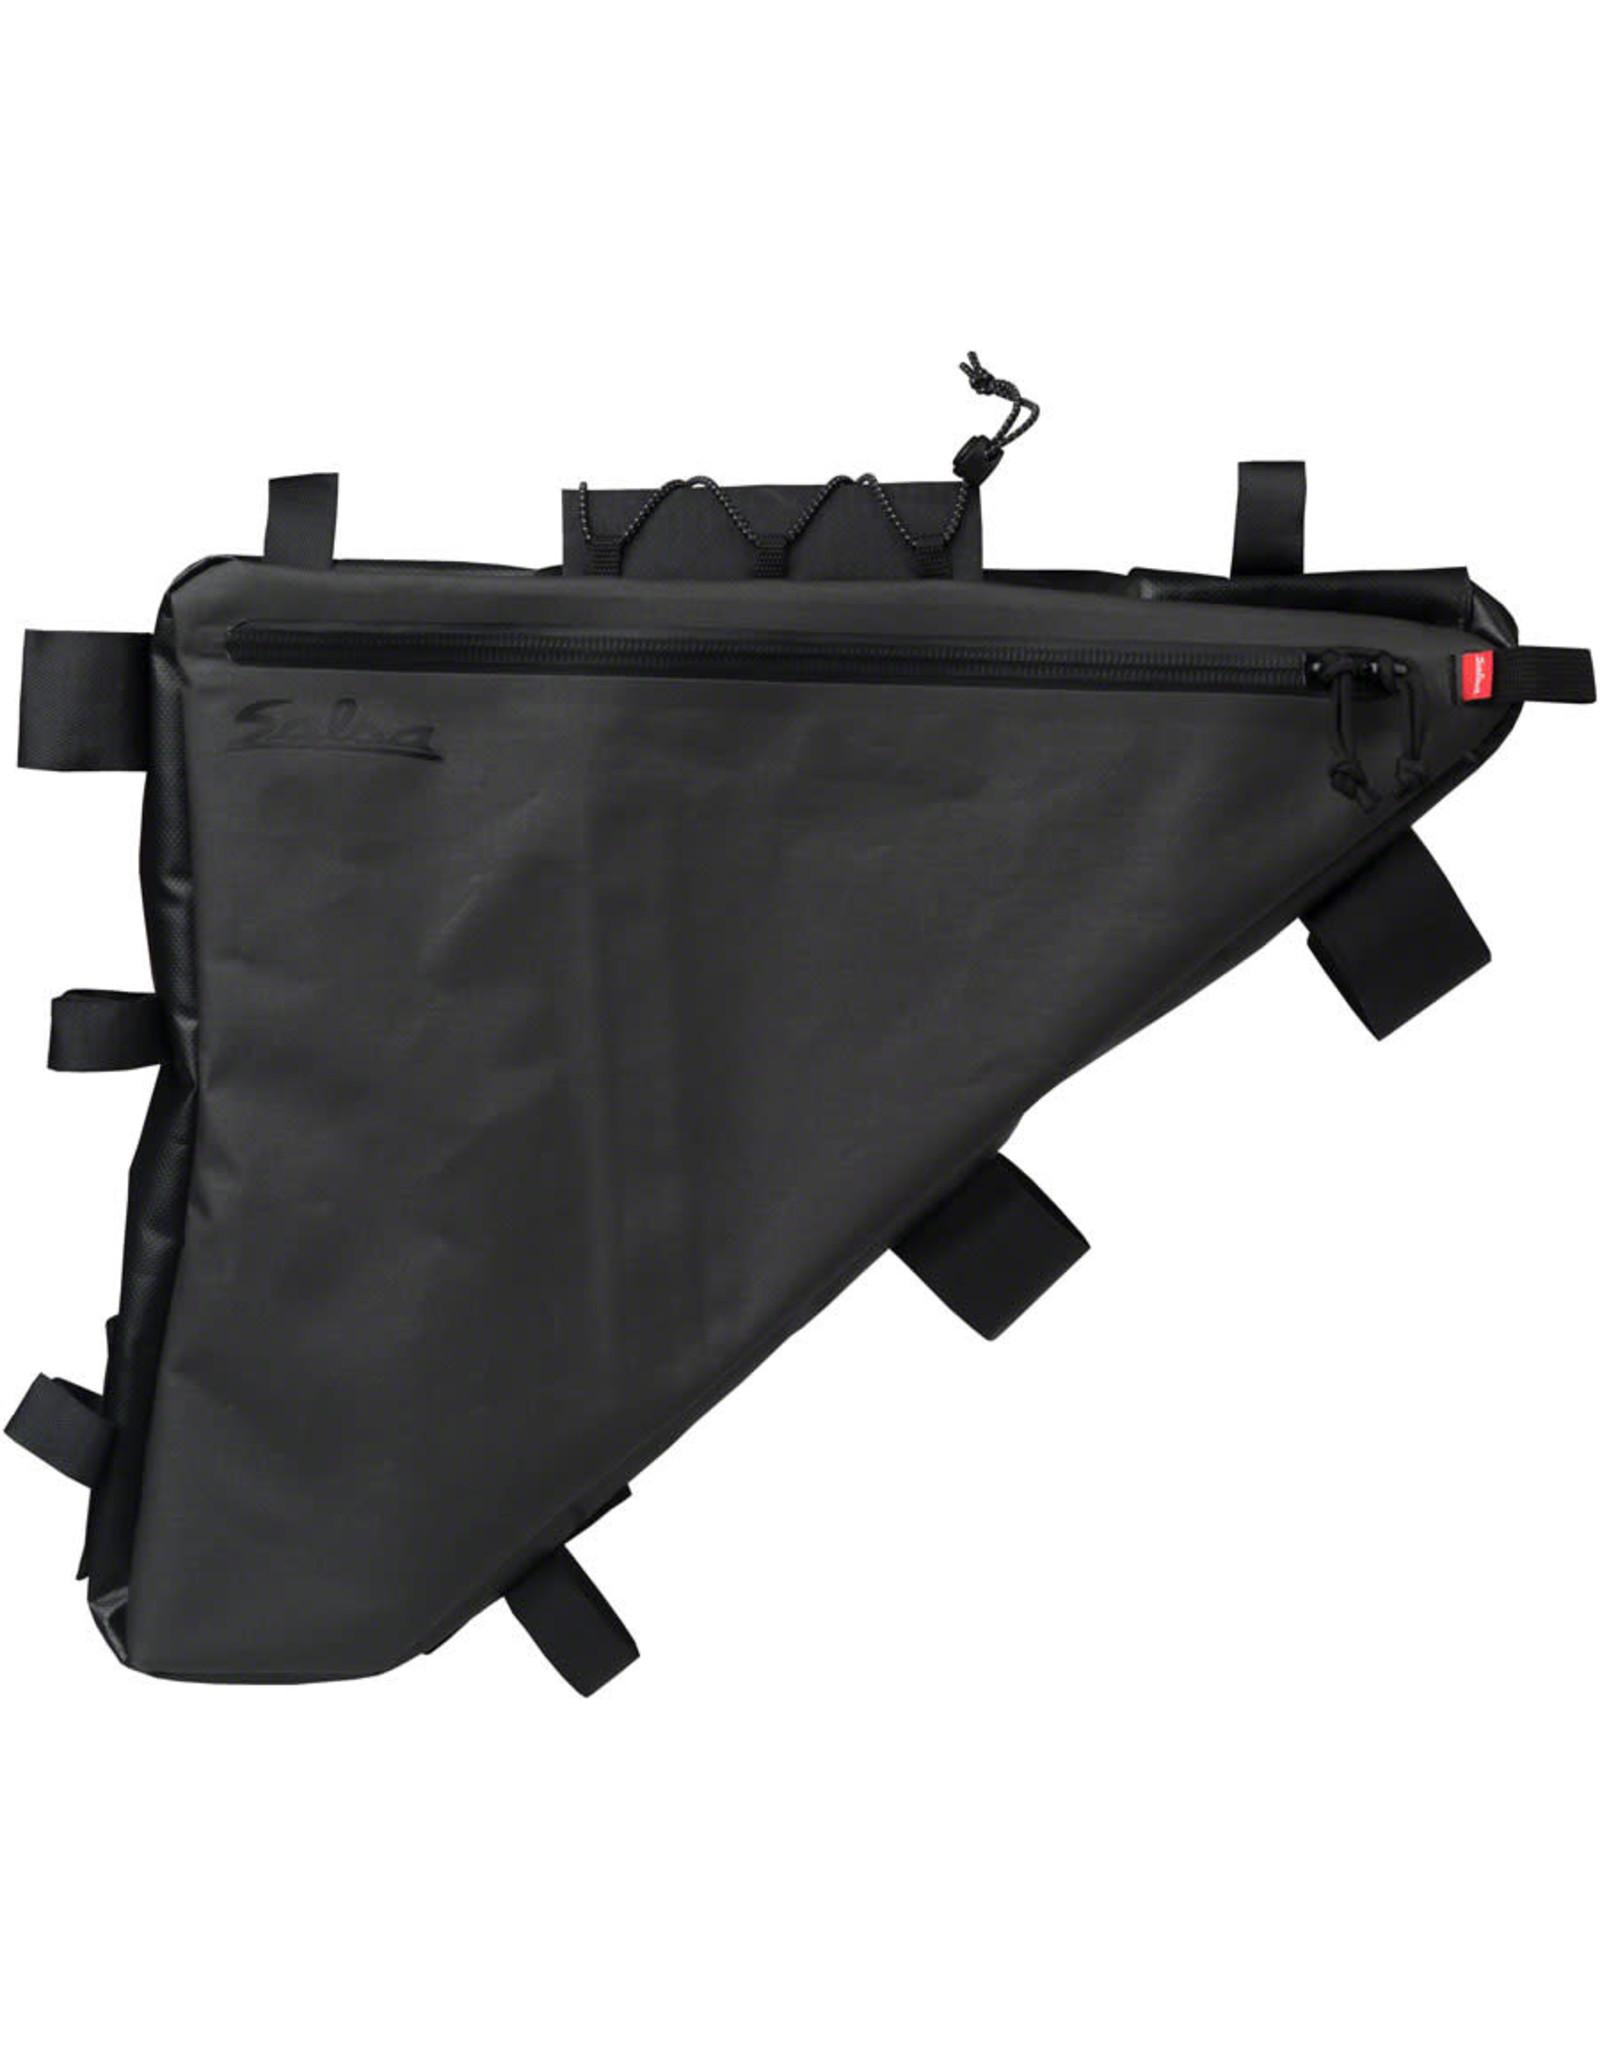 Salsa Cycles Salsa Frame Bag (El Mariachi Fargo Mamasita) Black XL